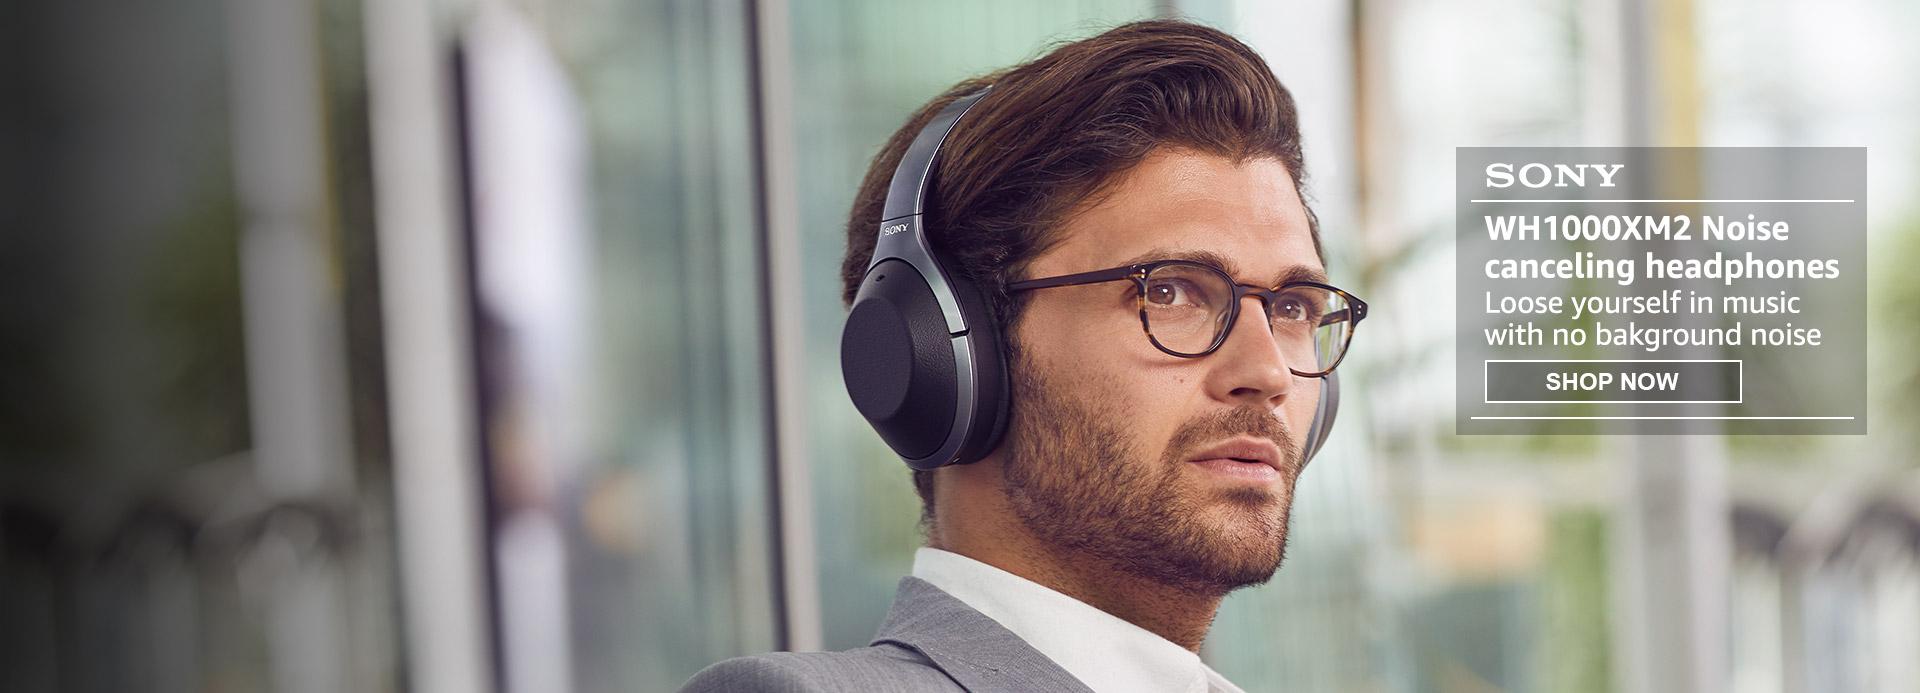 WH1000XM2 noise cancelling headphones